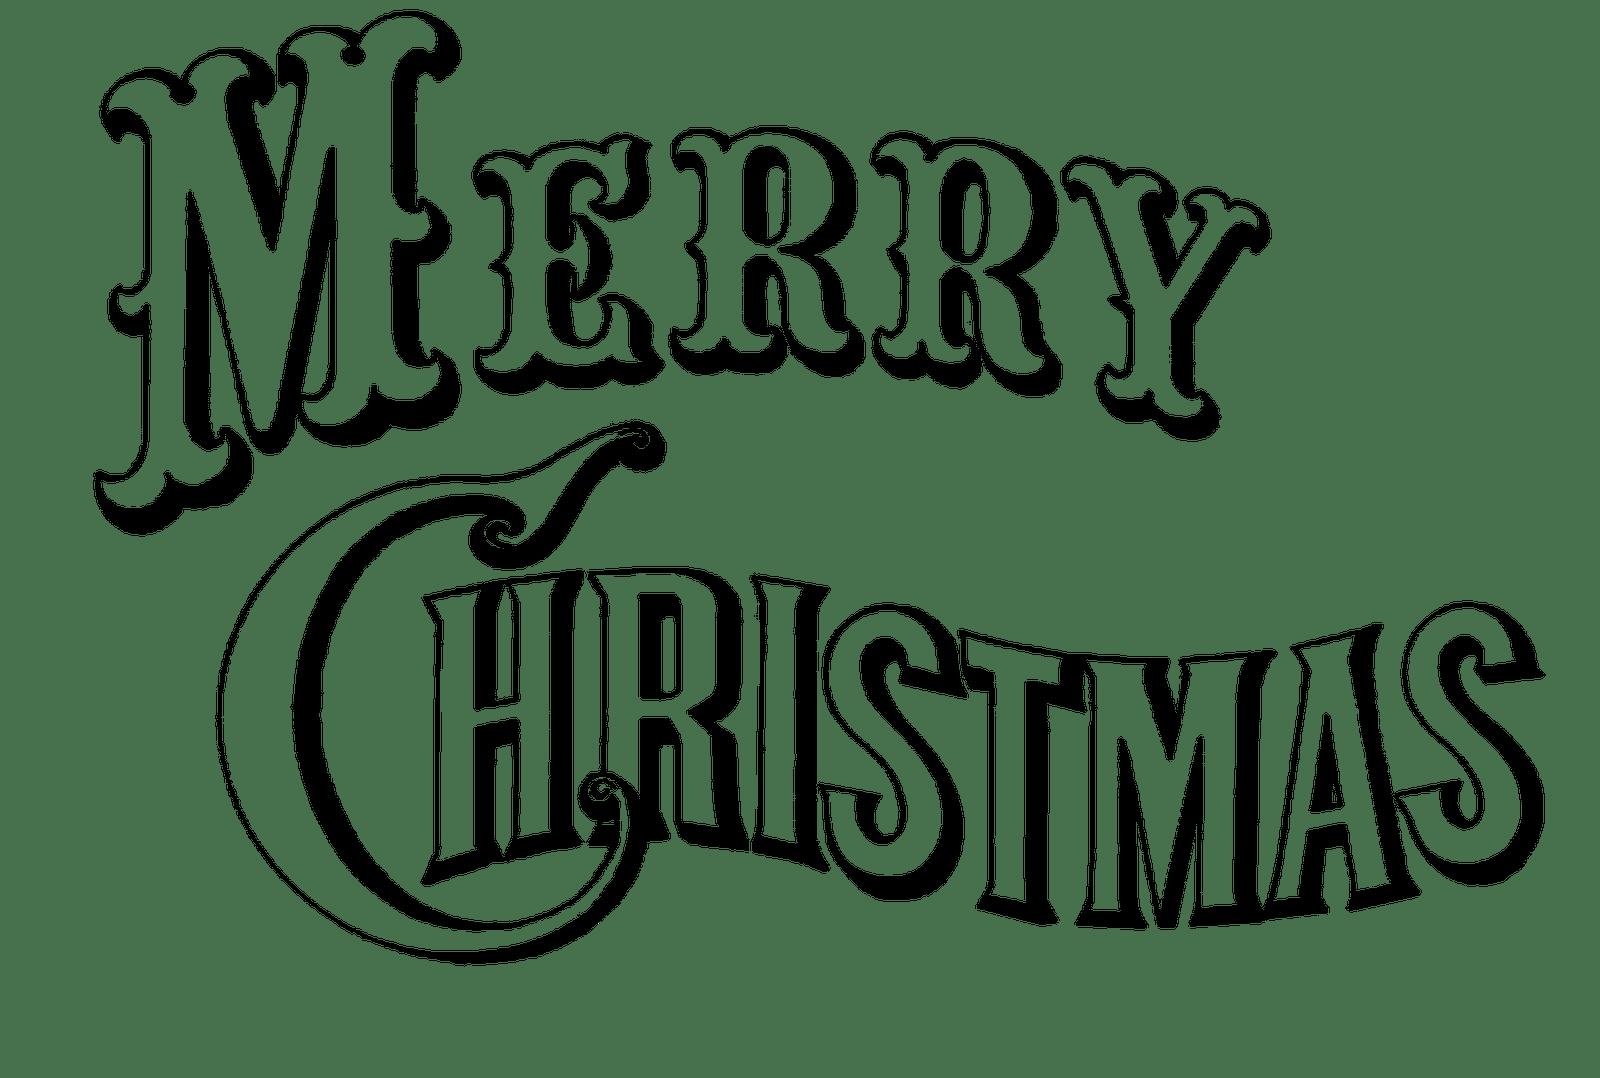 Merry christmas religious clipart svg transparent download Merry Christmas 2017 Clipart Free Download * - Happy Valentine Day ... svg transparent download